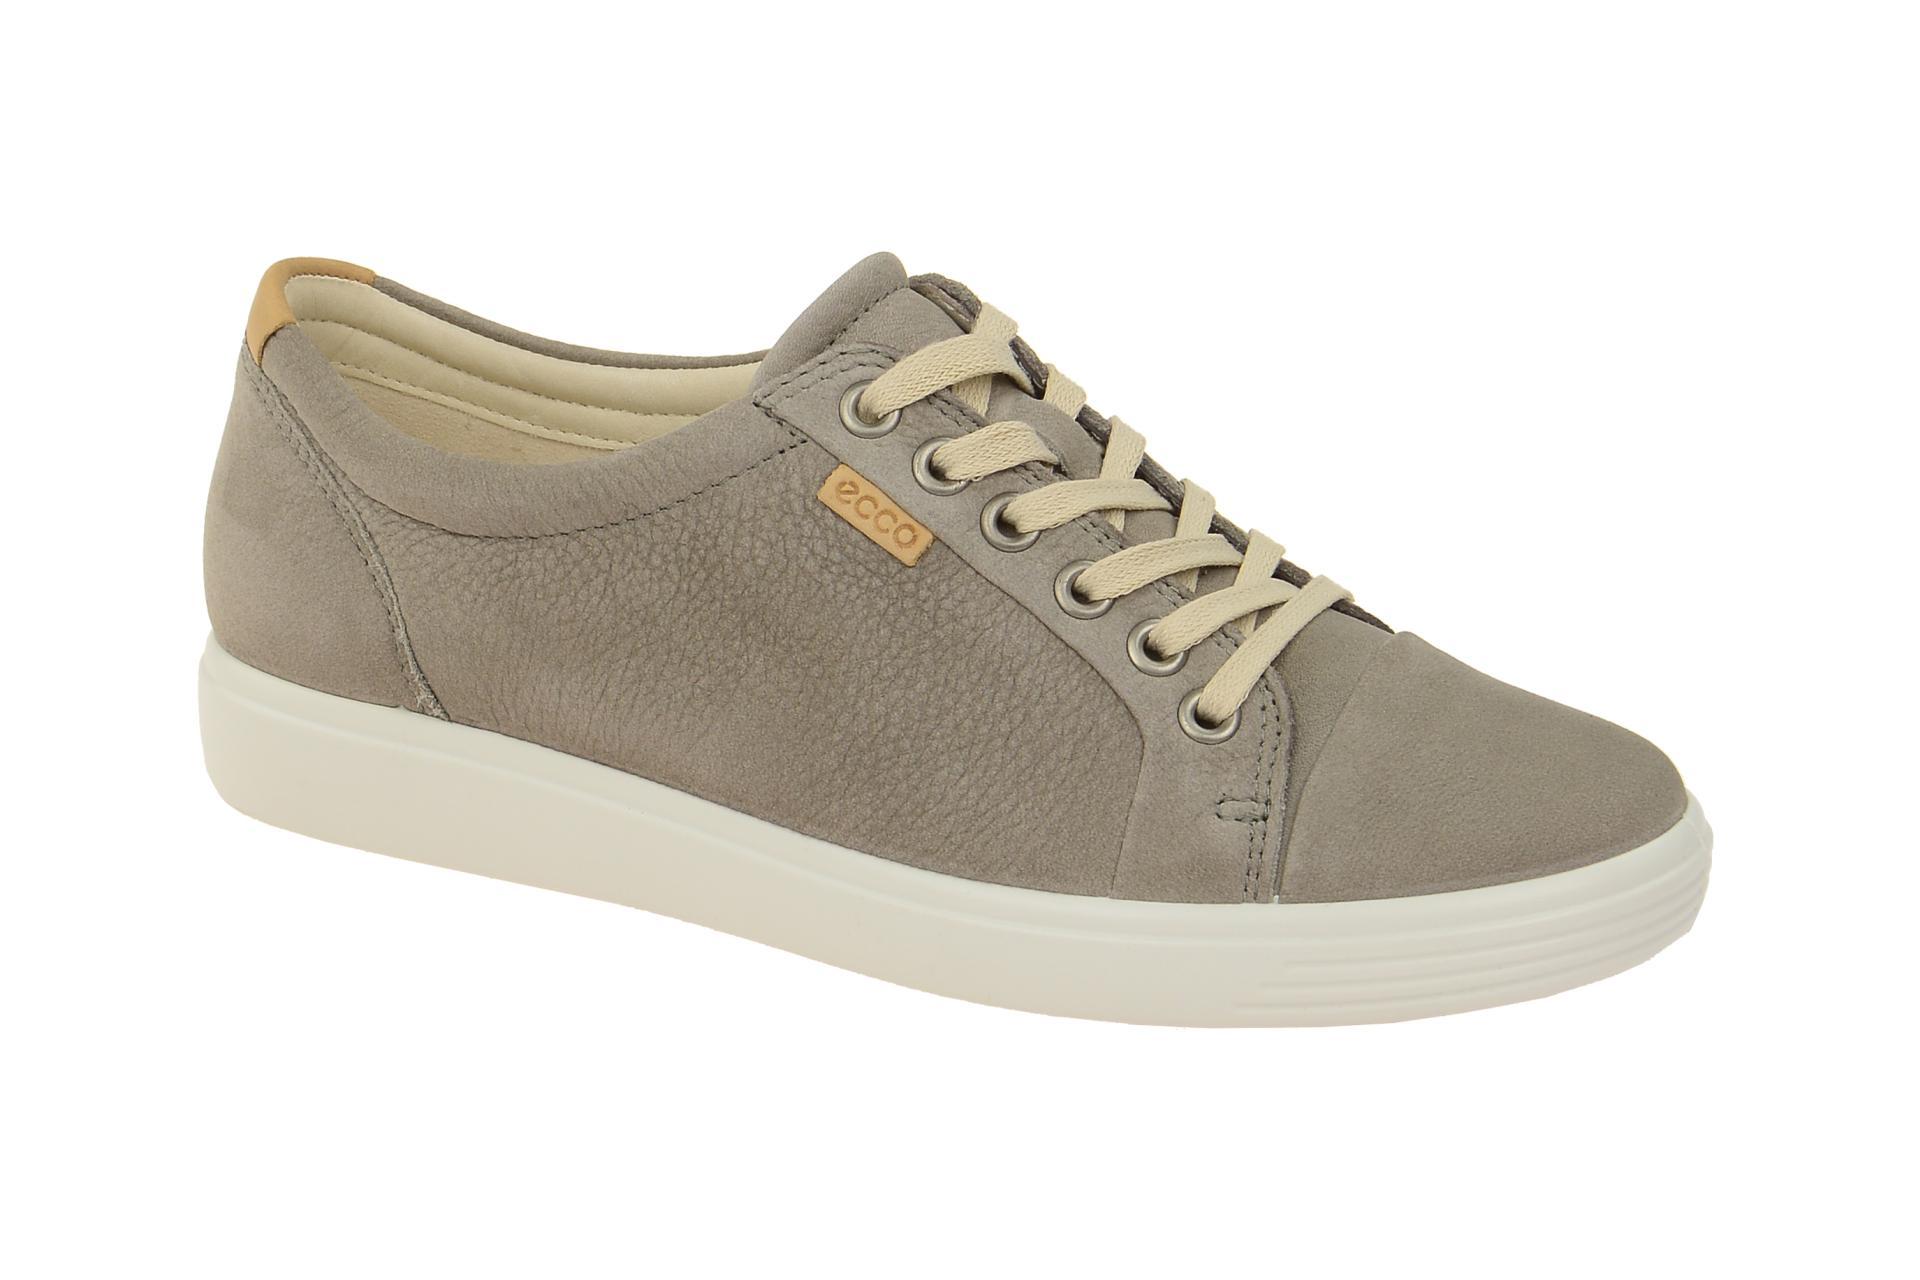 7 Damenschuhe LADIES grau 43000302375 Ecco NEUeBay SOFT Schuhe 5Rj34AqL